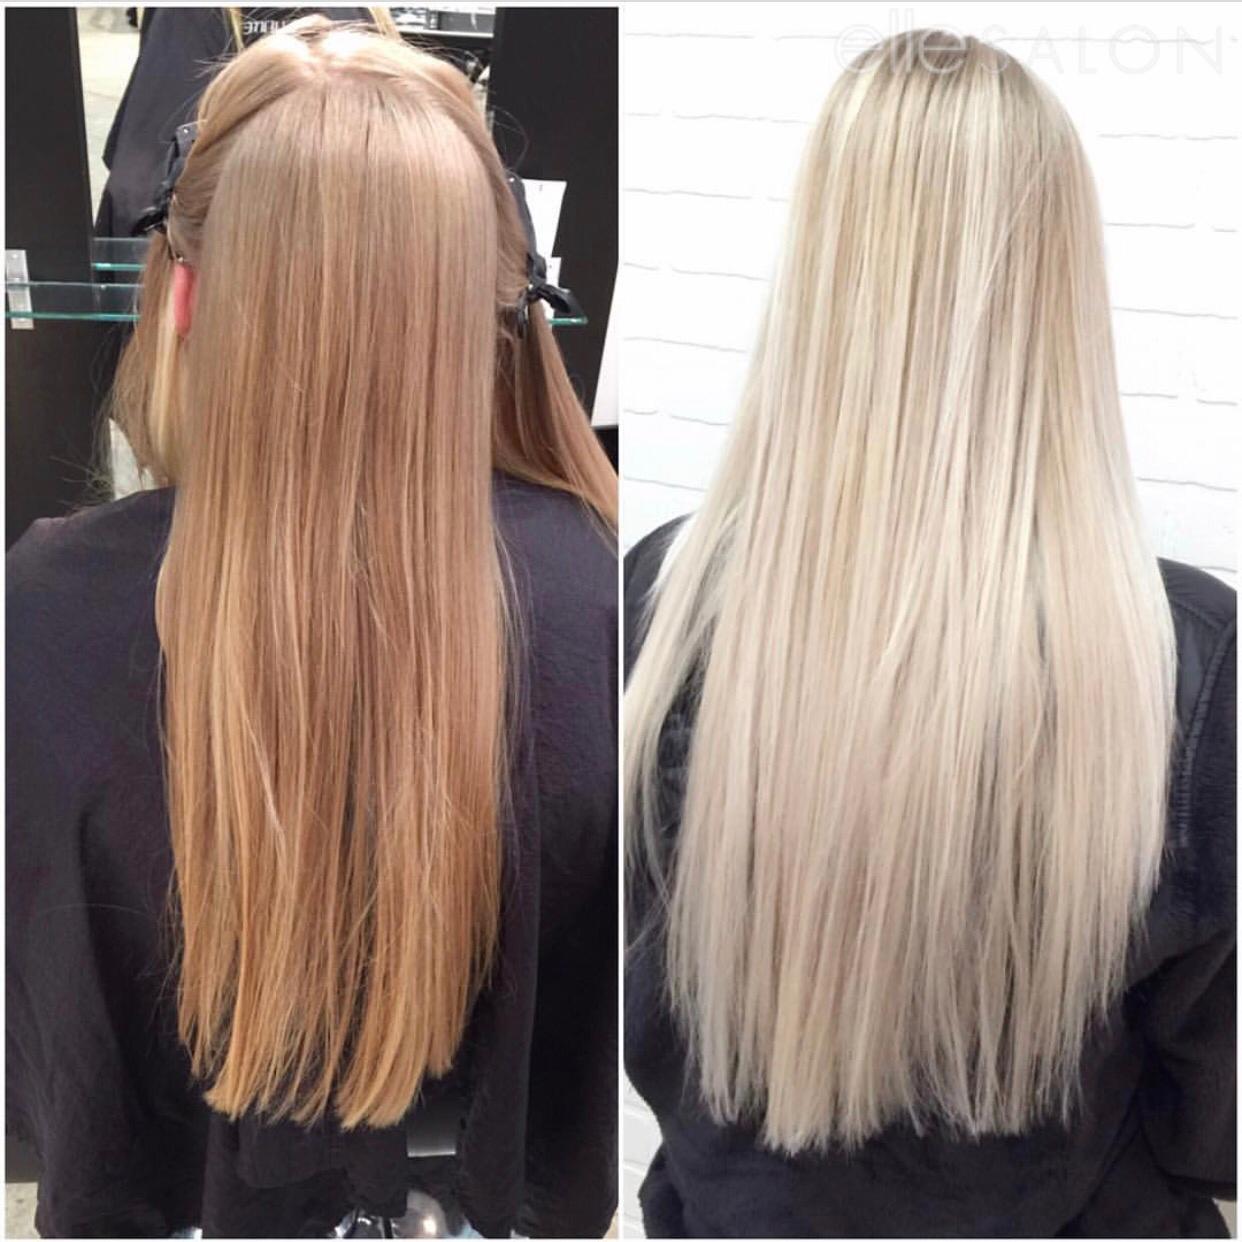 This Is #CRAZY! Hair By @jordynf_ellesalon